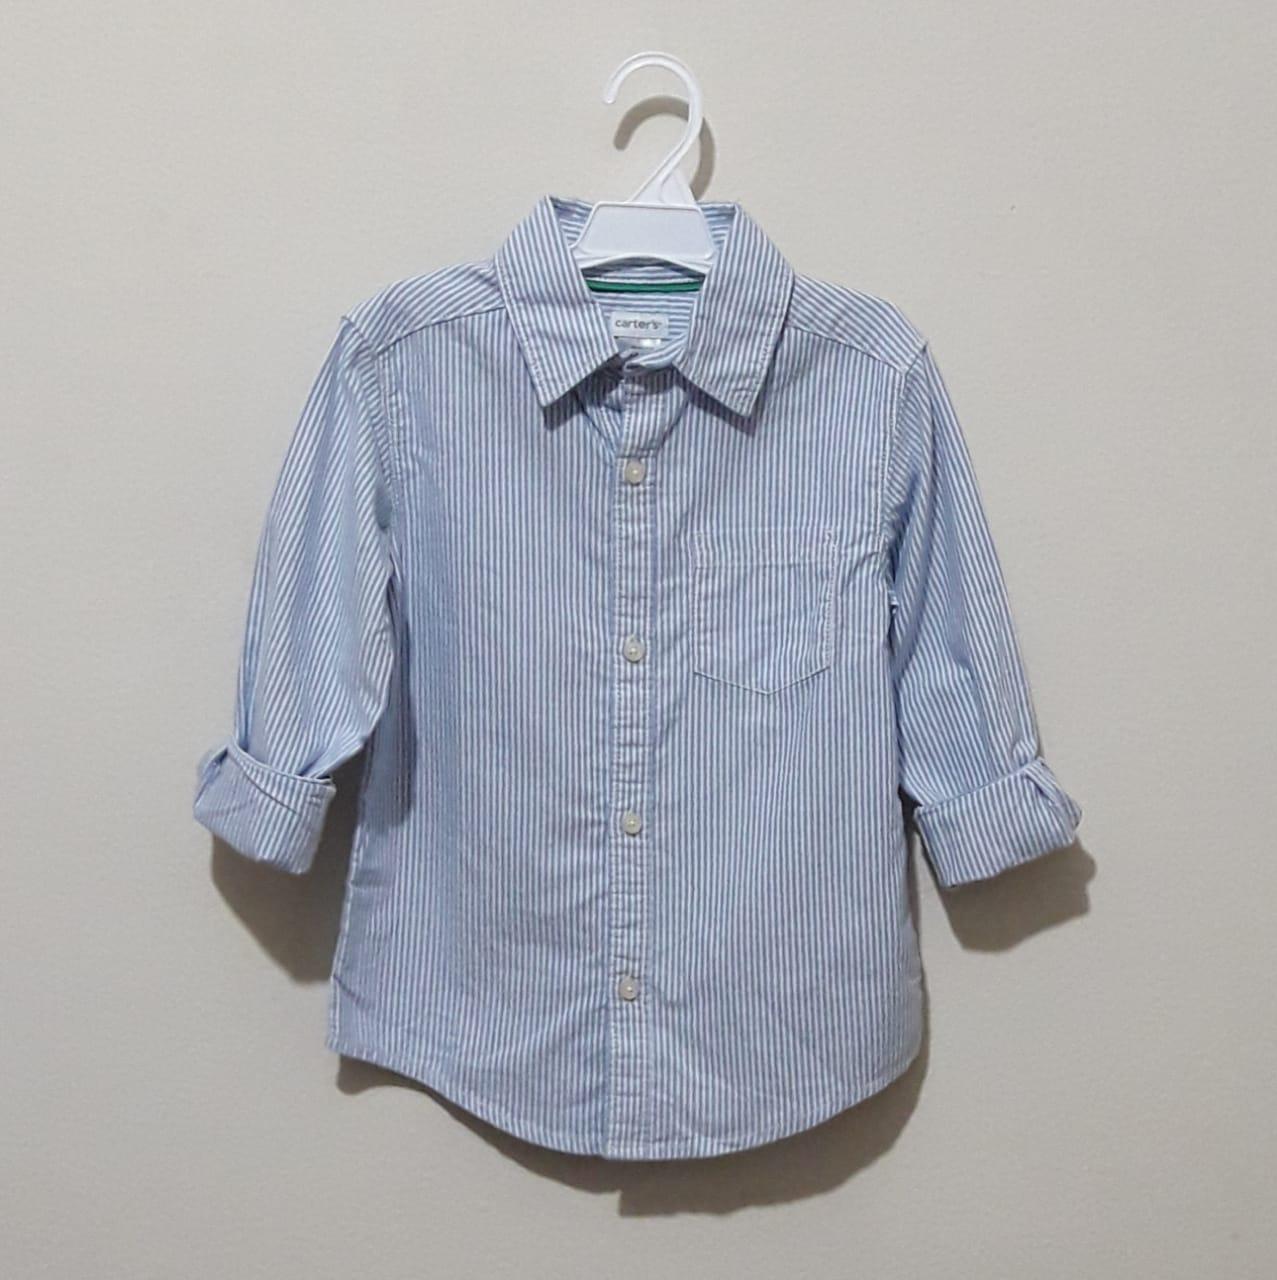 Camisa Manga Longa Listrada Azul Claro - Carter's